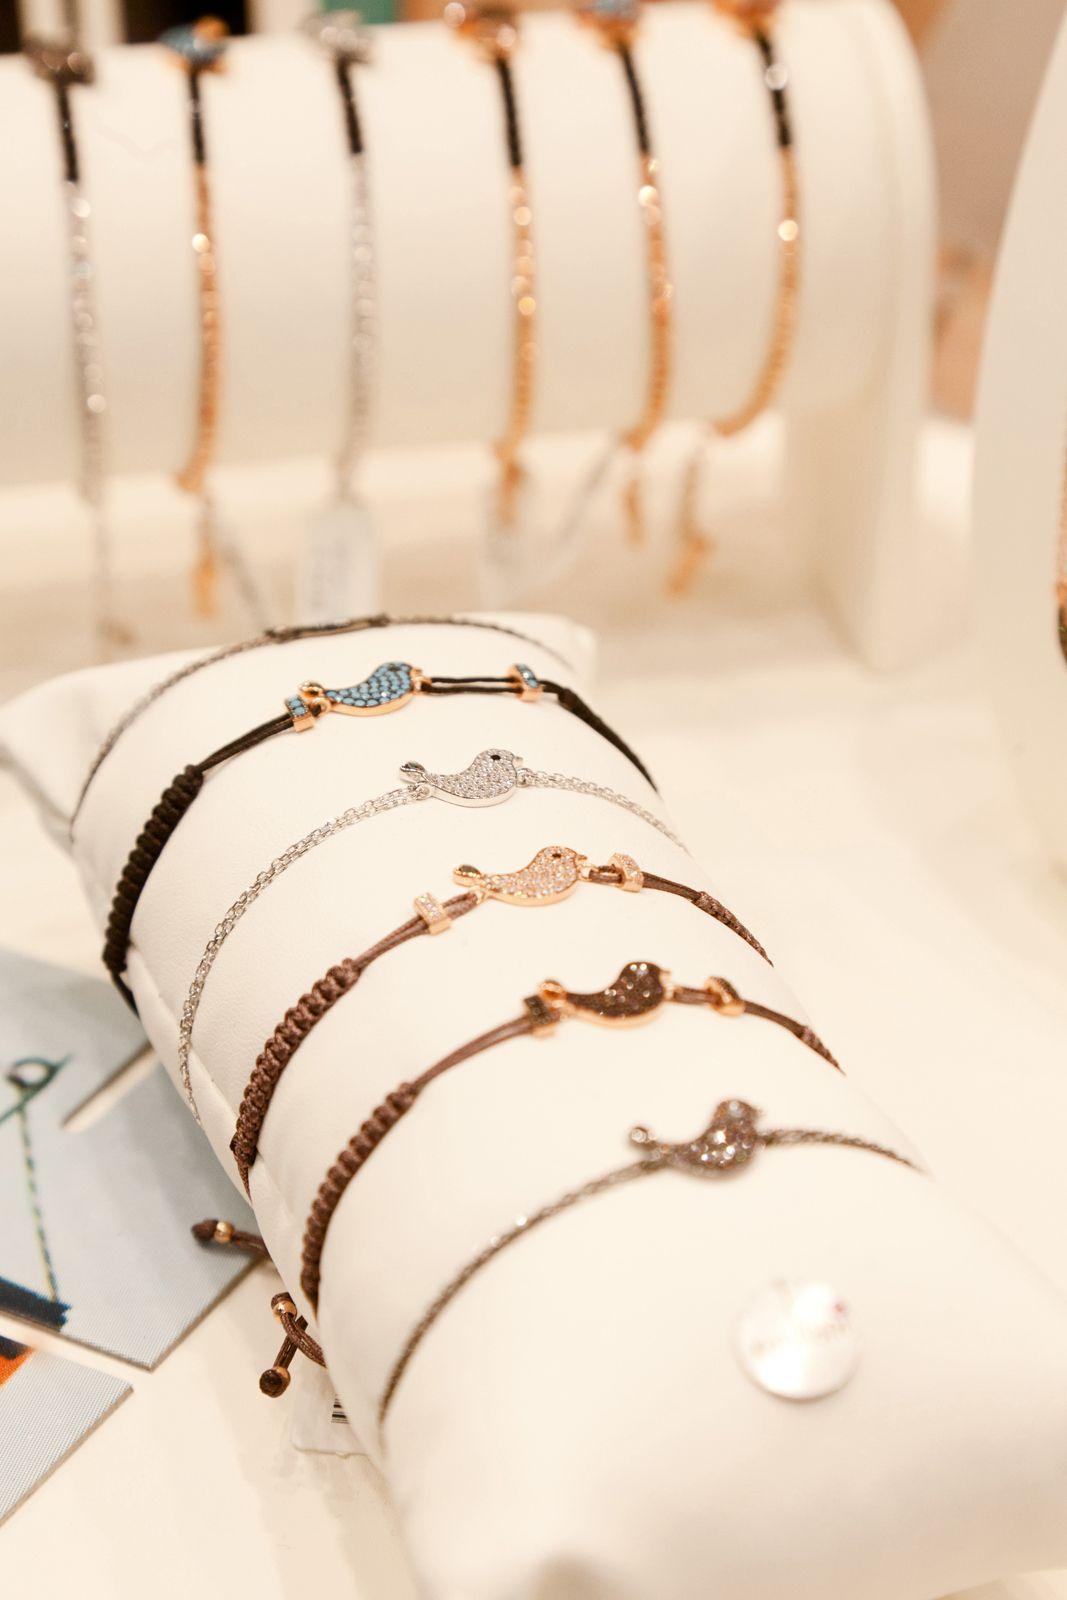 Kurshuni bracelets   www.aibijoux.com #kurshuni #fashionjewelry #HOMI15 #HomiMilano #AIBIJOUX